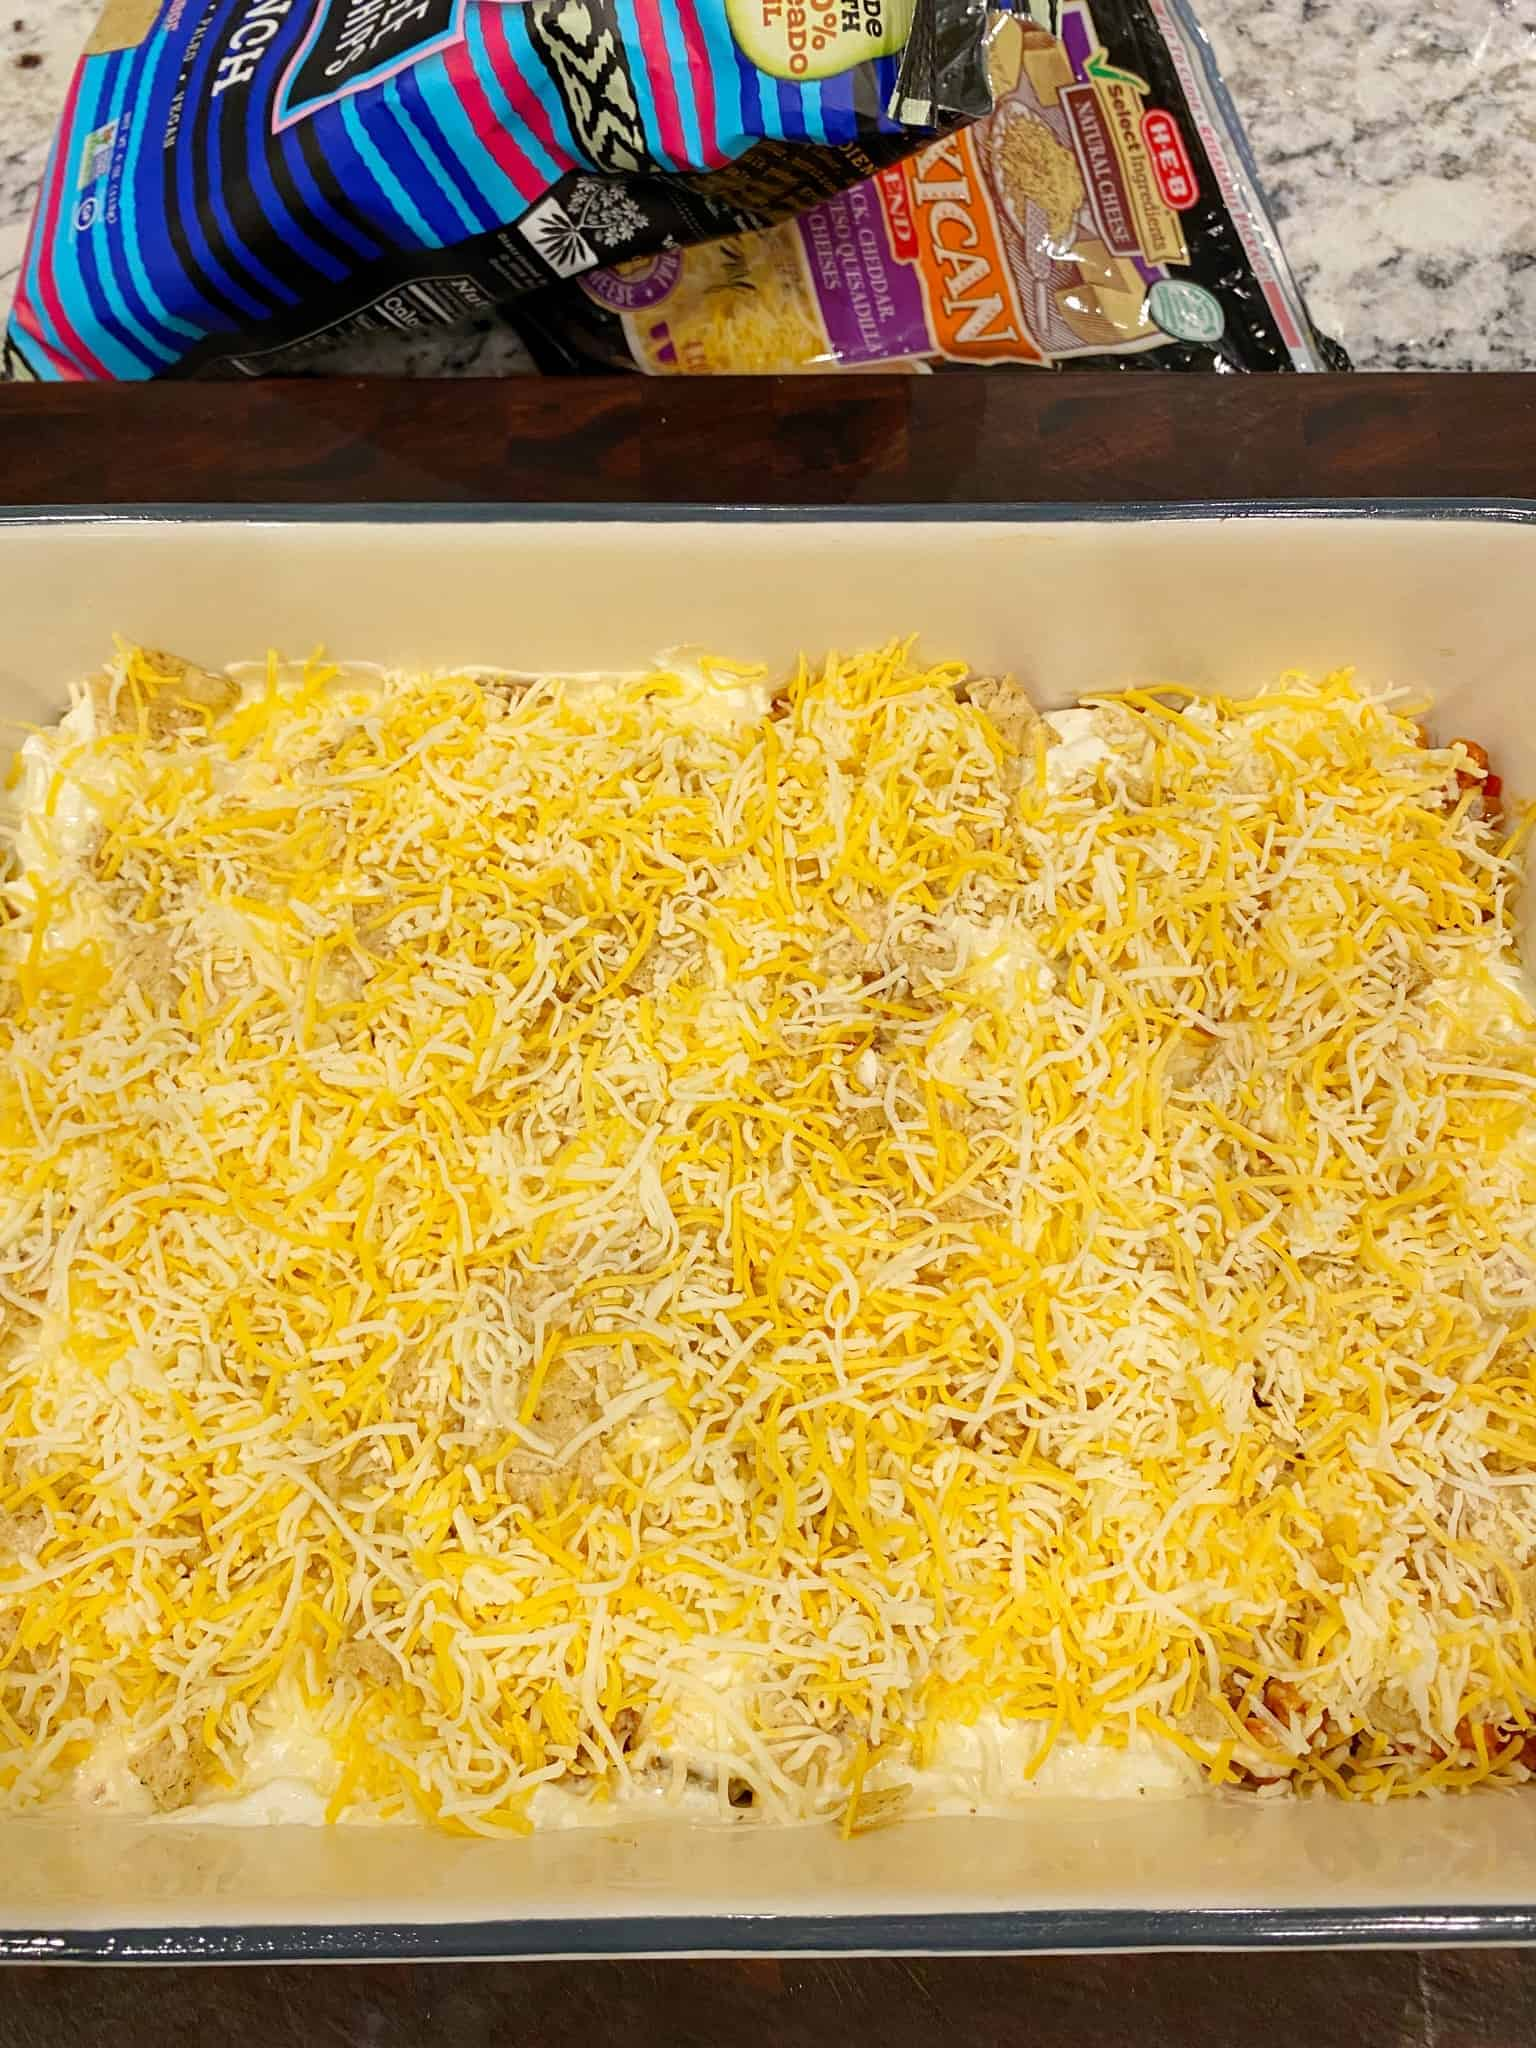 Taco-Casserole-Weight-Watchers-cheese